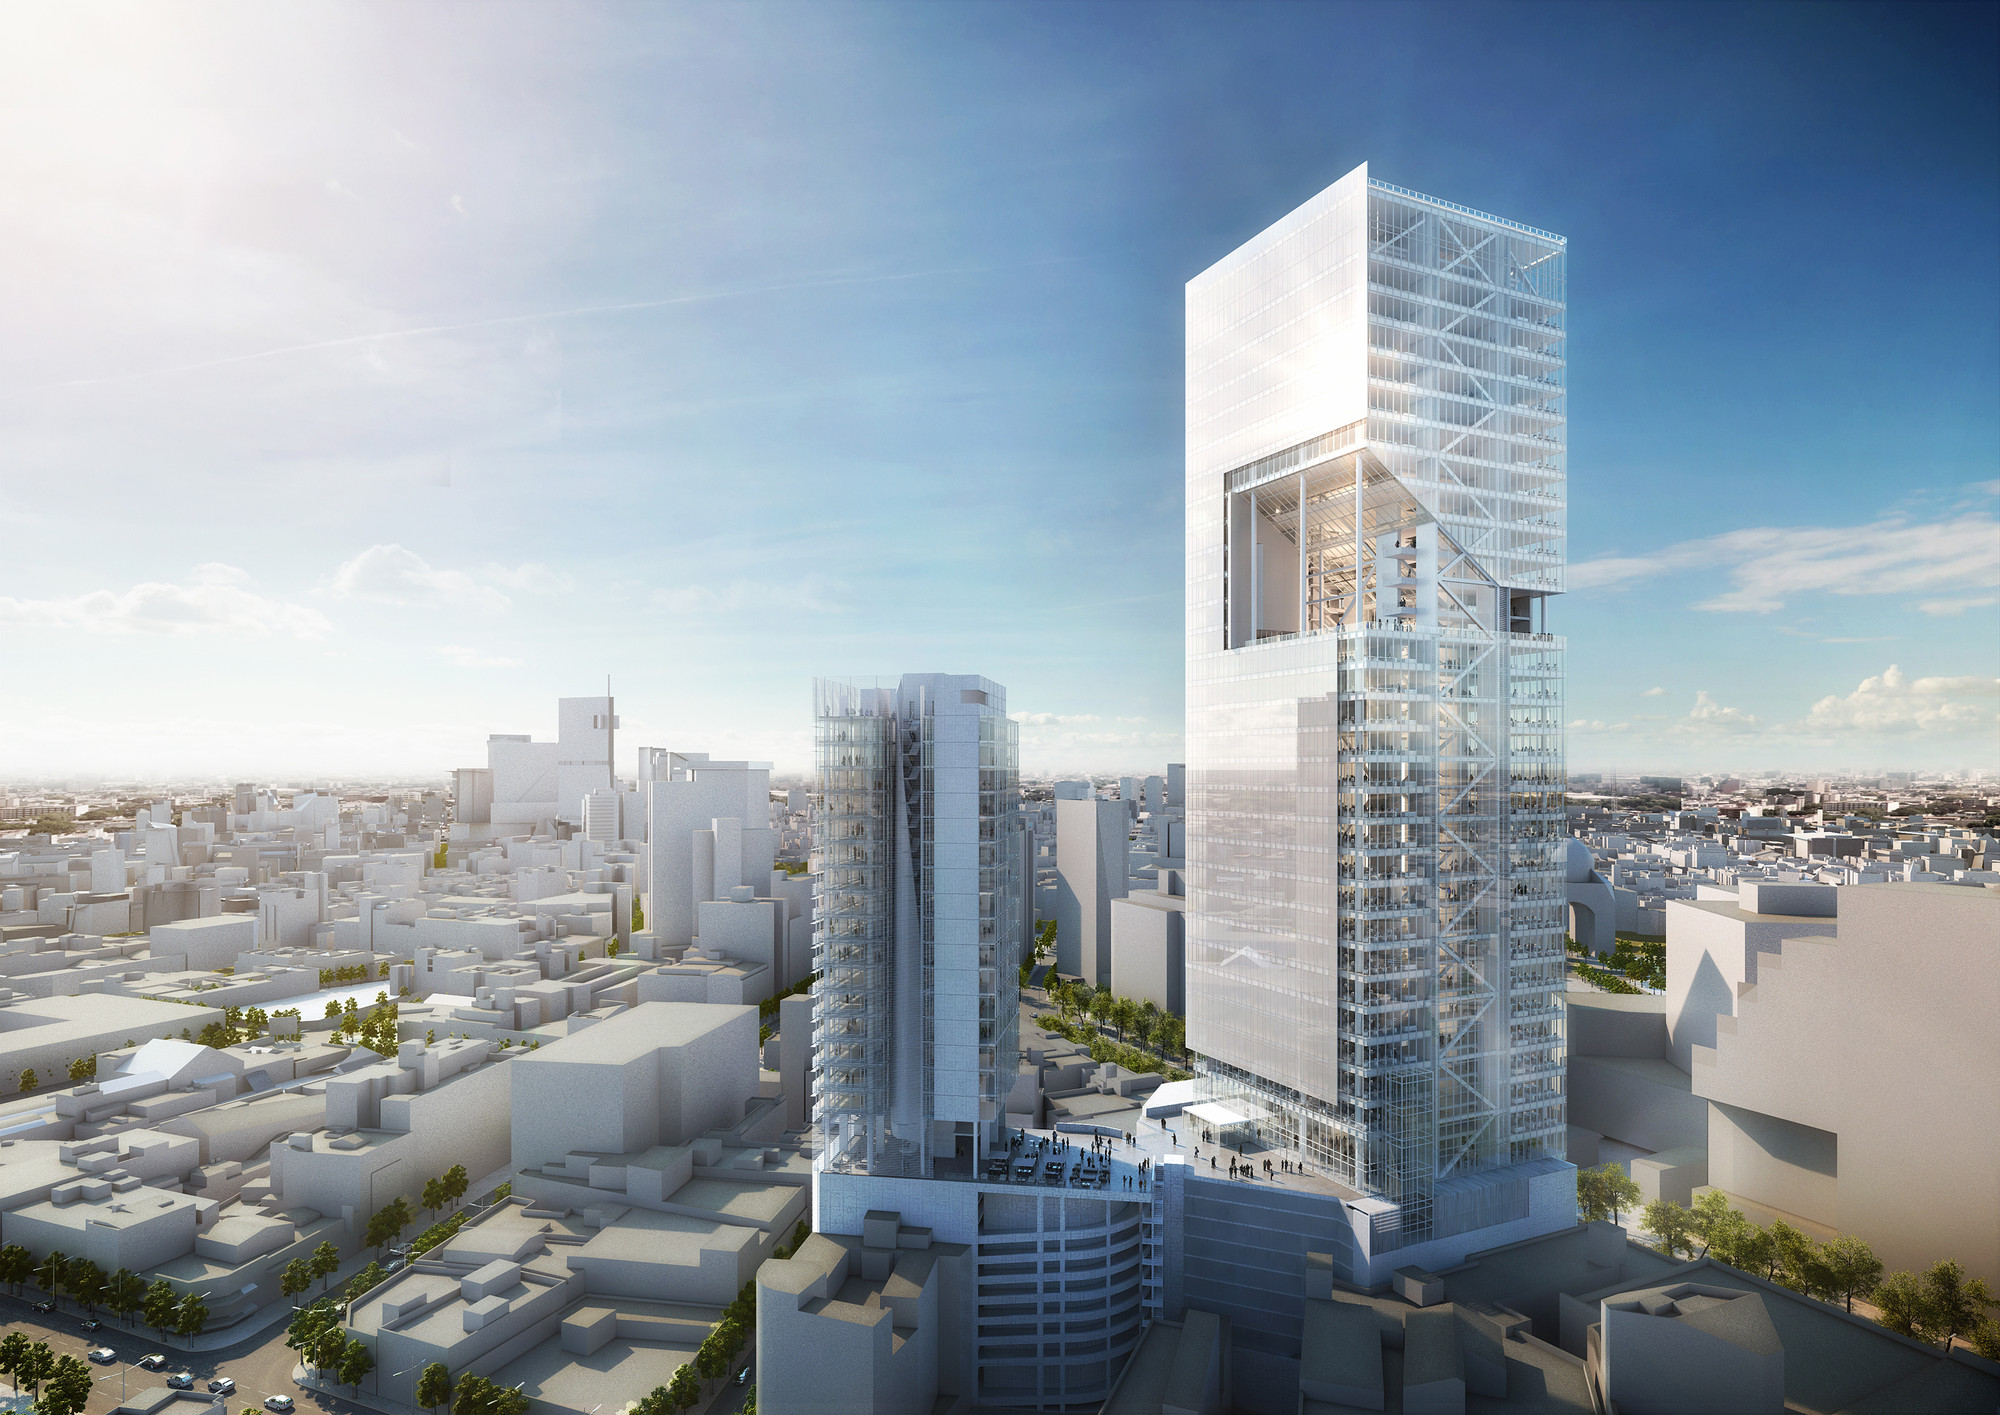 Richard meier unveils 180 meter tower development in mexico richard meier unveils 180 meter tower development in mexico reforma towers image courtesy sciox Images